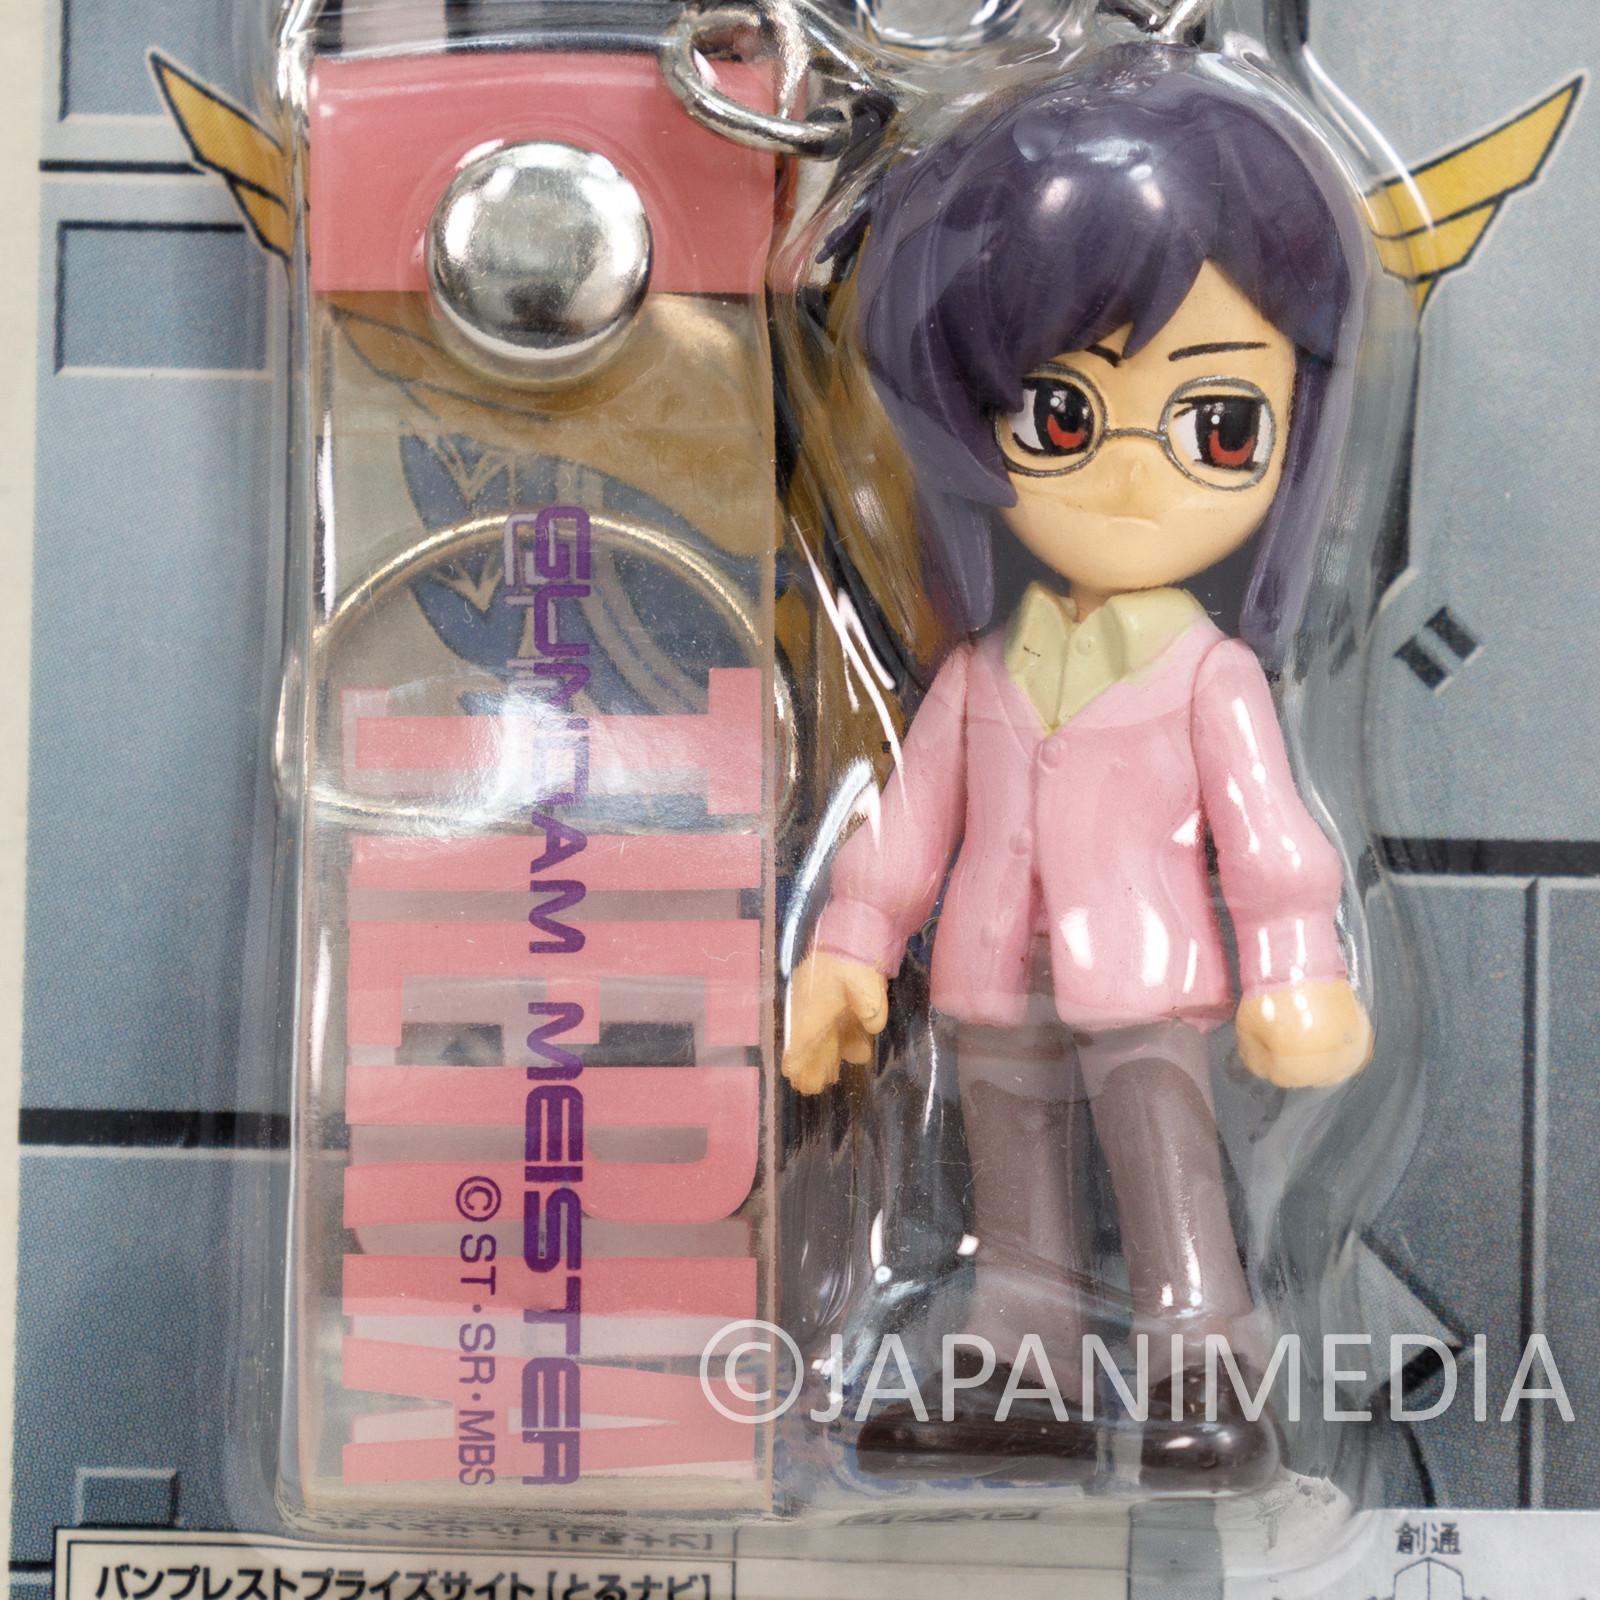 Mobile Suit Gundam 00 Tieria Erde Figure Strap Banpresto JAPAN